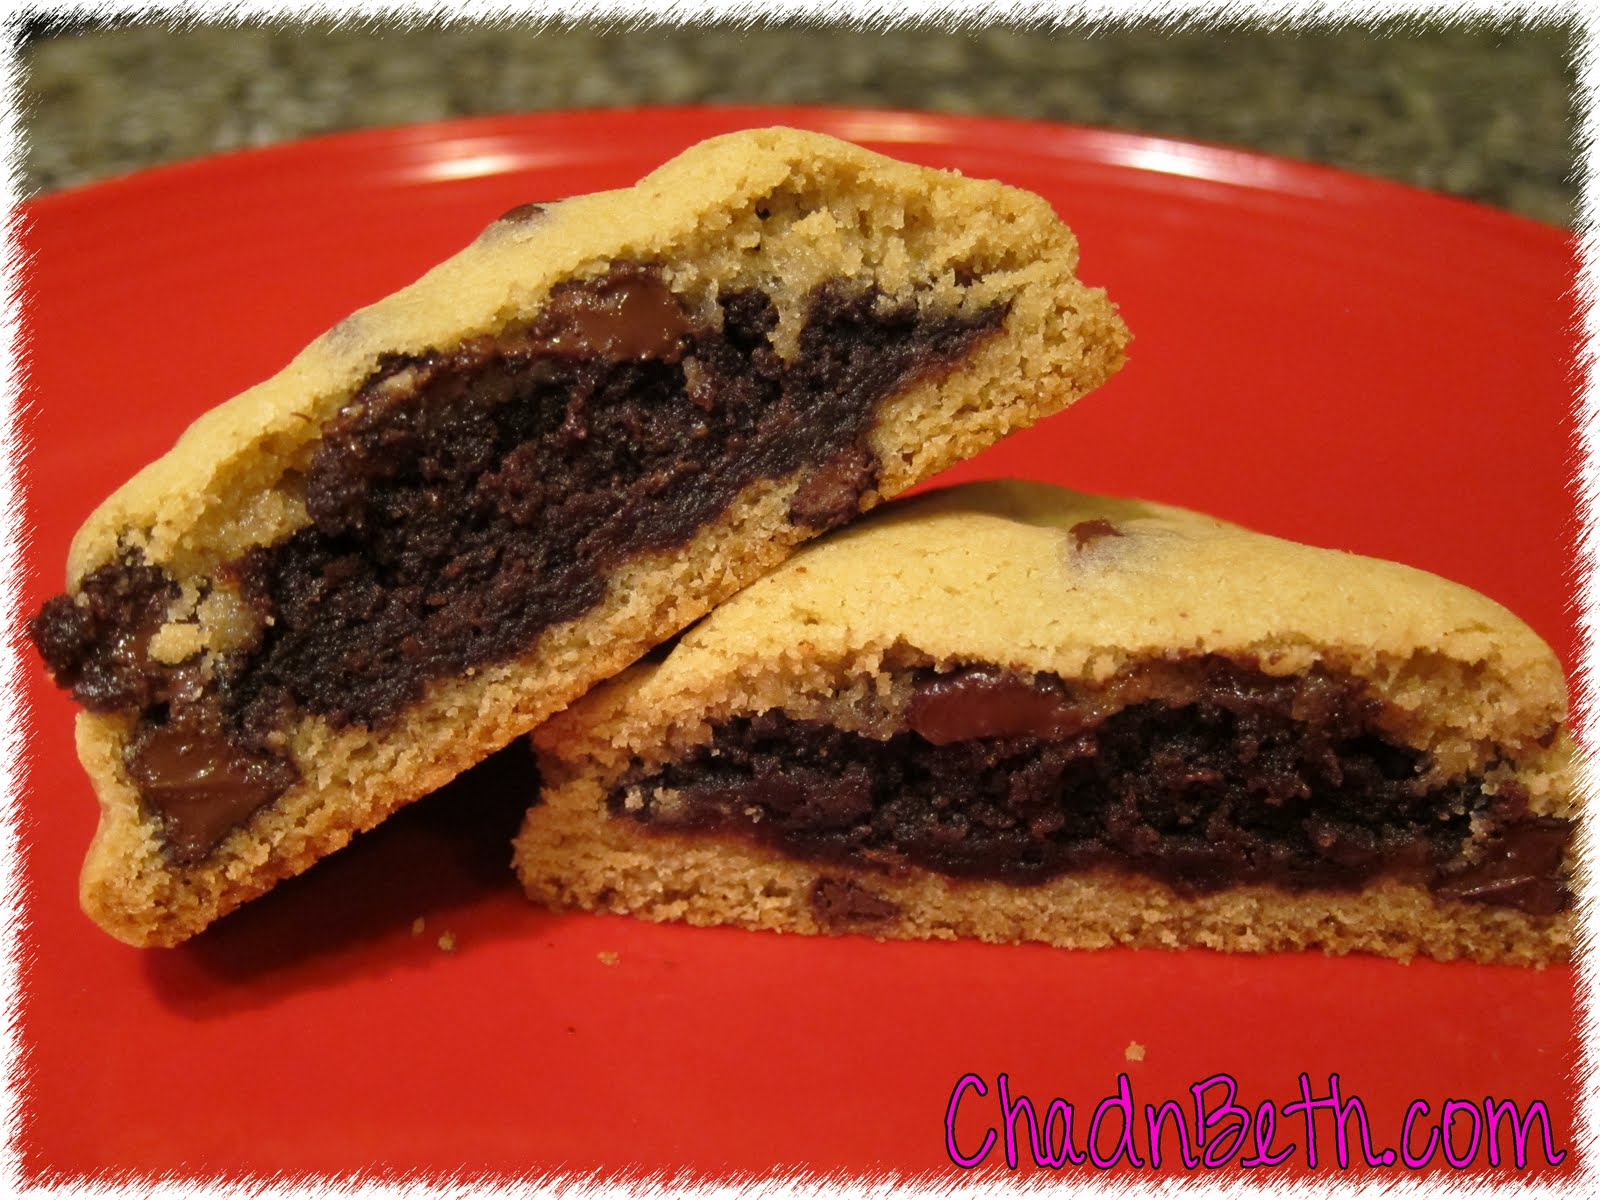 Chad and Beth: Brownie Stuffed Chocolate Chip Cookies